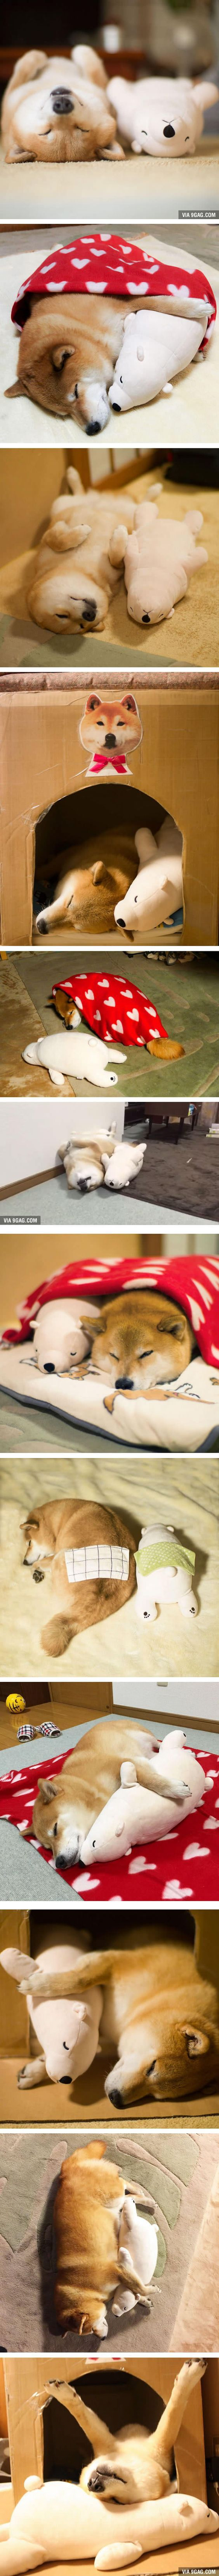 Shiba Inu Maru Loves To Sleep With His Little Stuffed Polar Bear Toy: